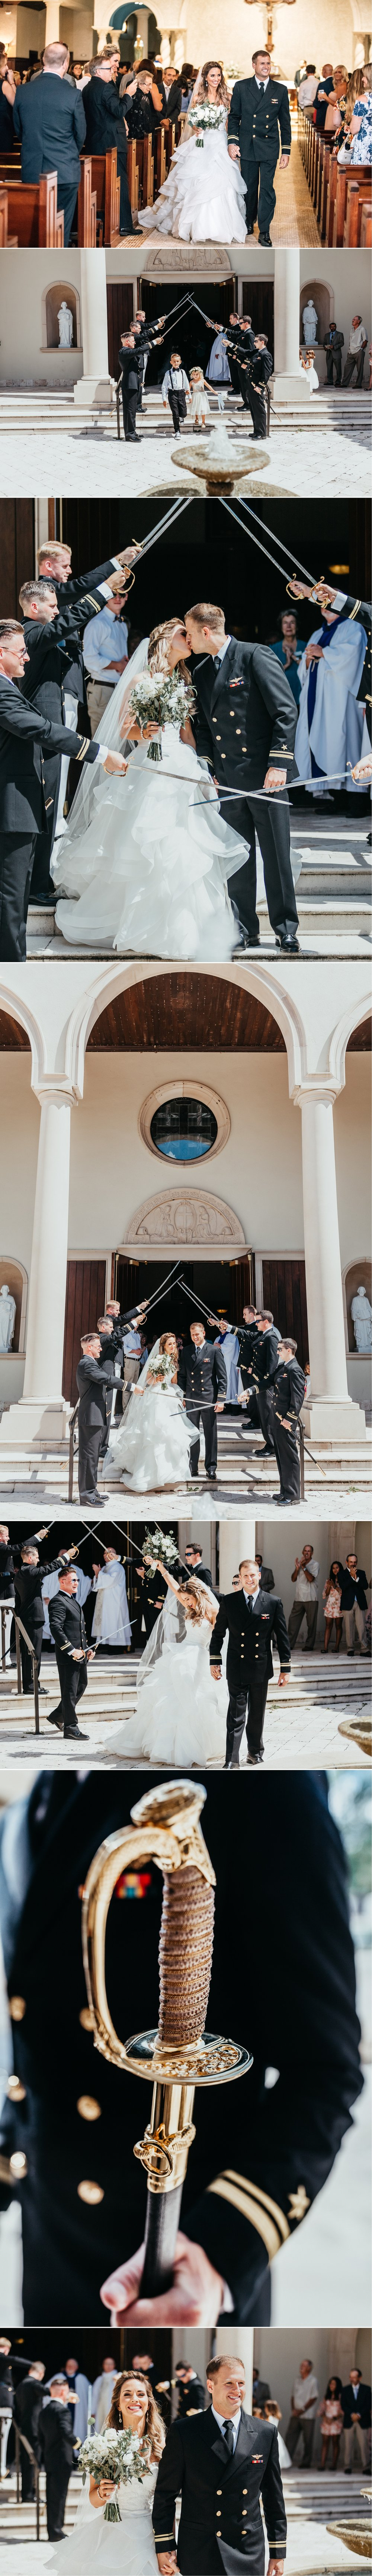 Farmhouse Chic Bowing Oaks Plantation Wedding- Orlando Photographer  11.jpg